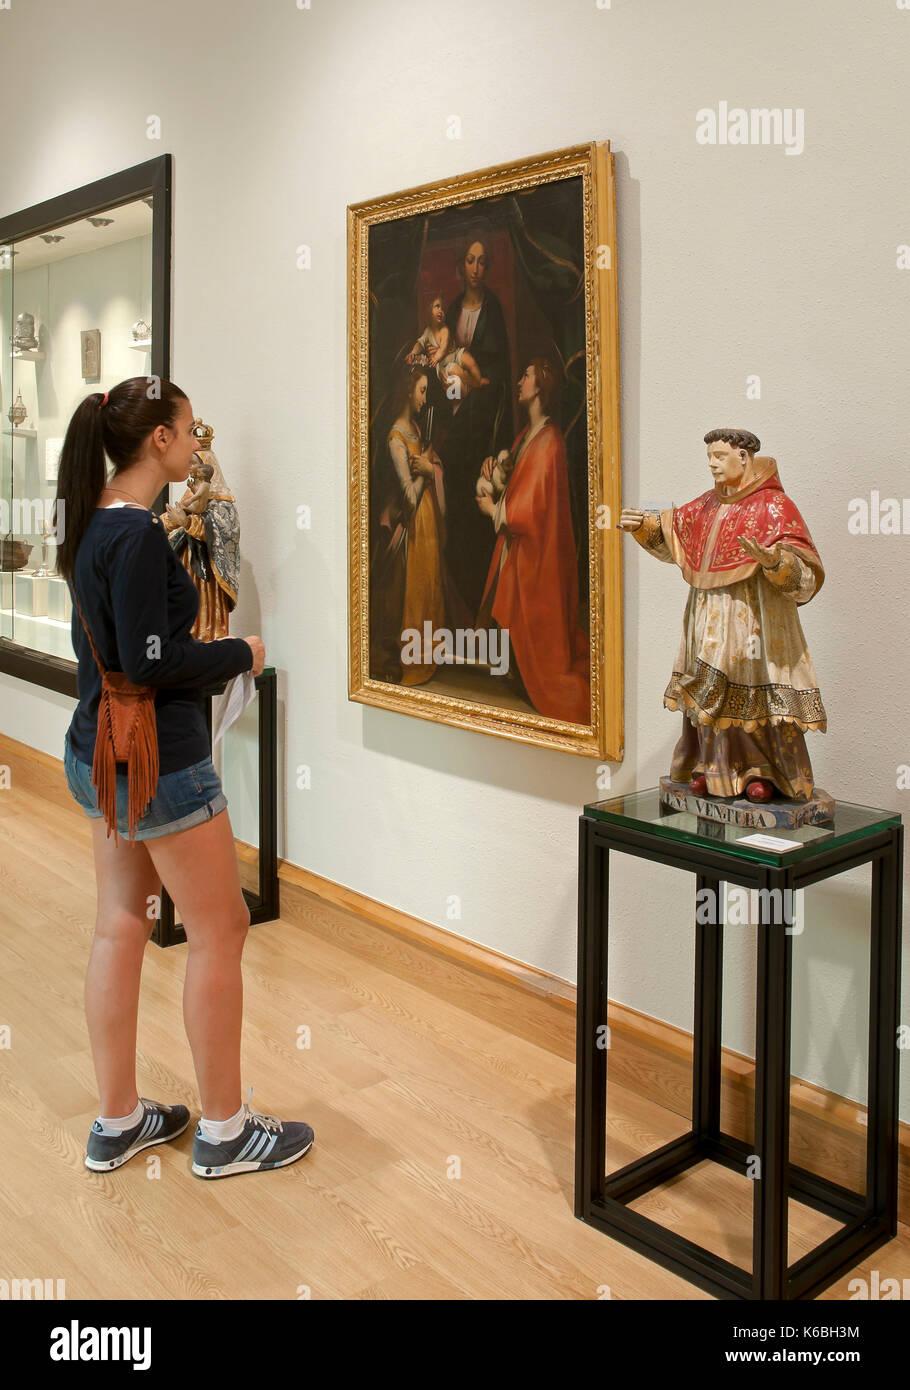 Provincial museum - visitor, Lugo, Region of Galicia, Spain, Europe Stock Photo